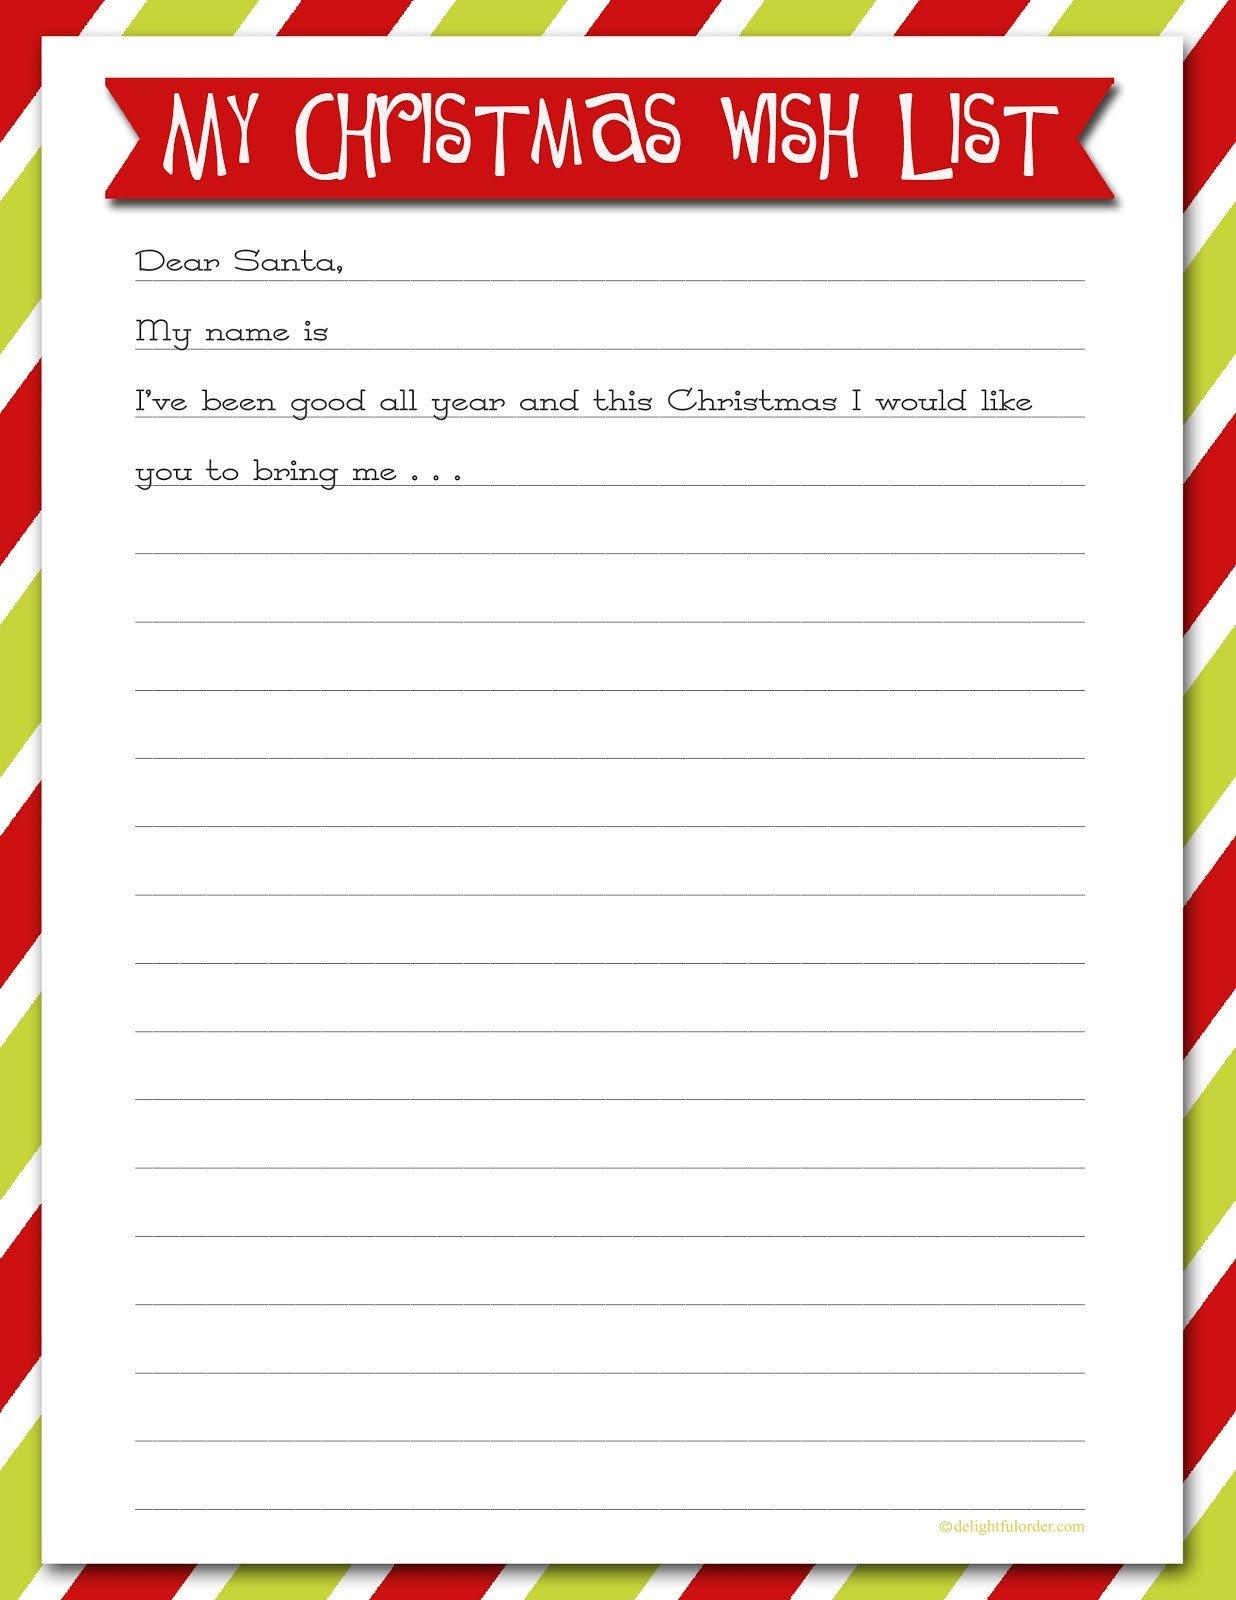 Christmas List Template Word Printable Christmas Wish Lists are We there yet